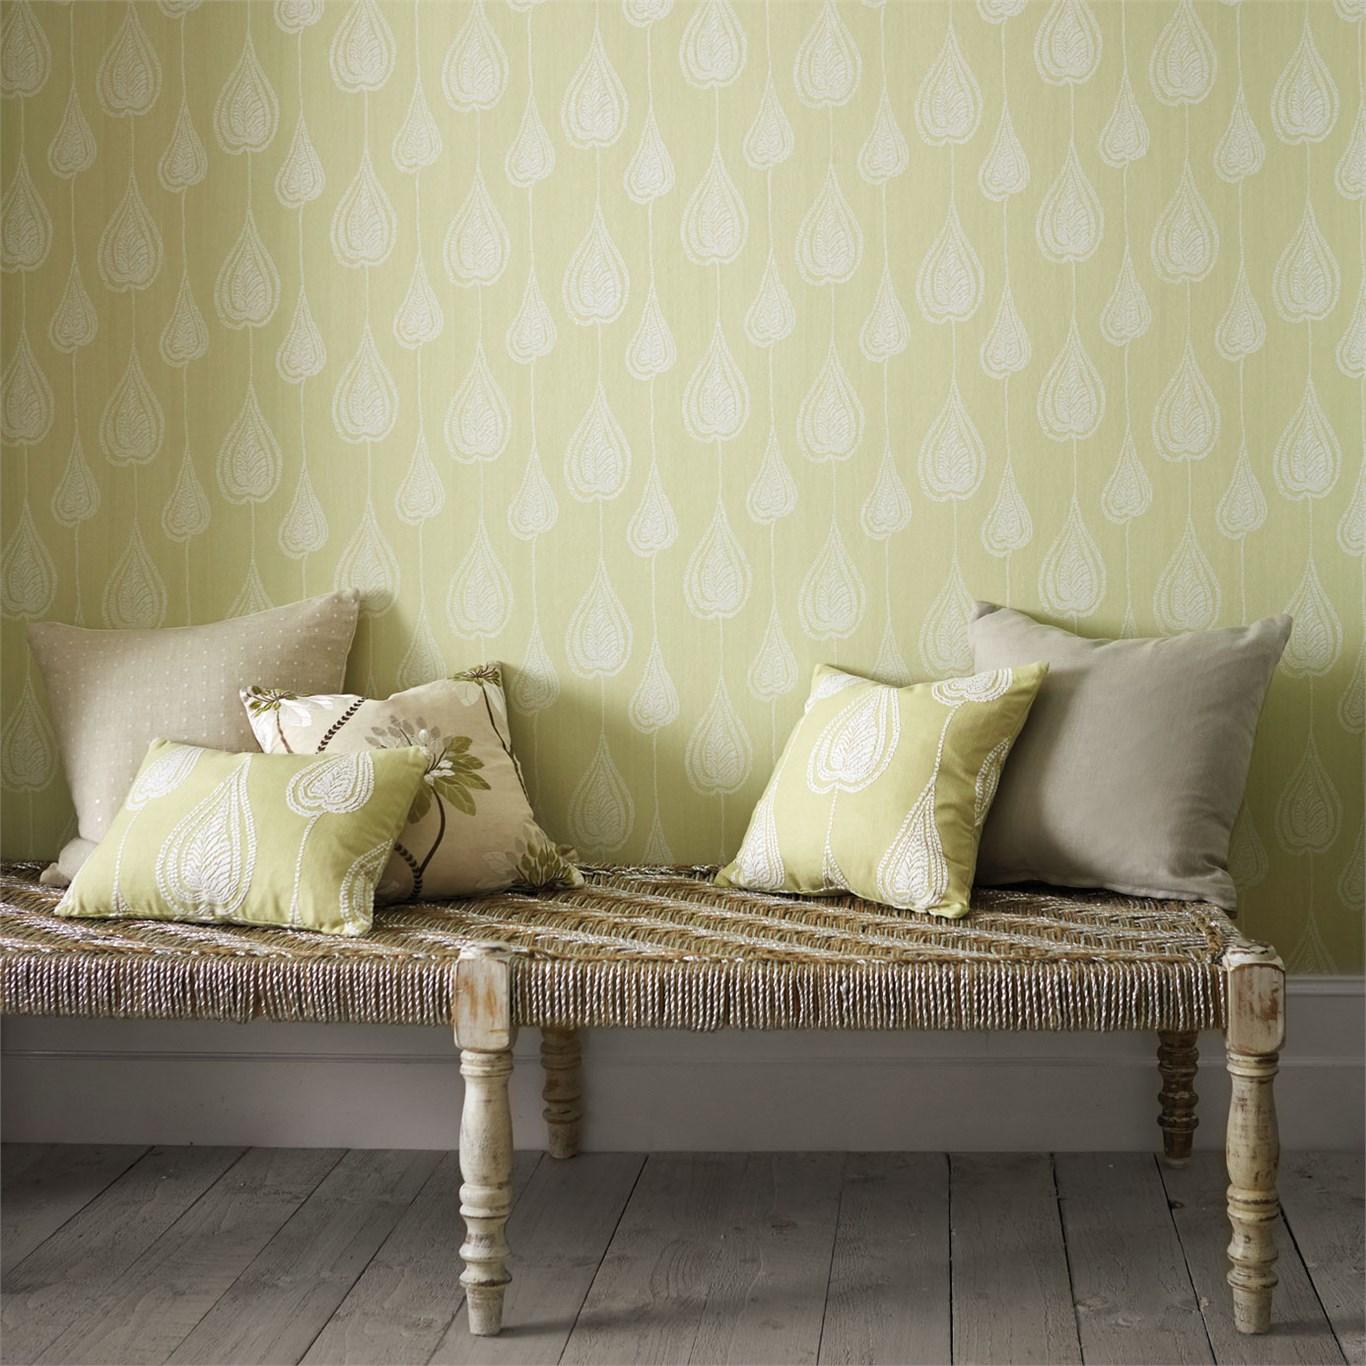 Harlequin-Purity-Wallpapers-15.jpg